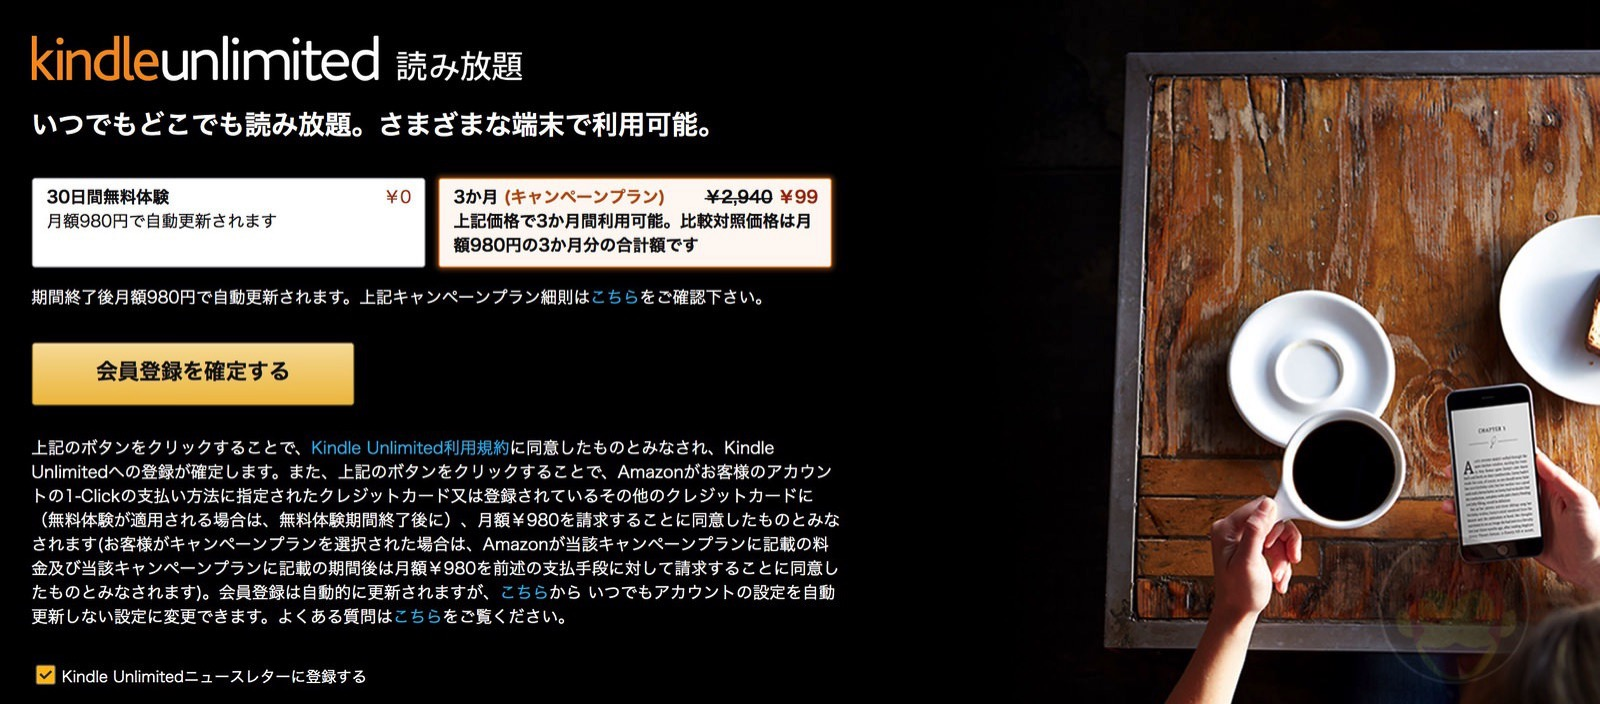 Kindle Unlimited sale 03